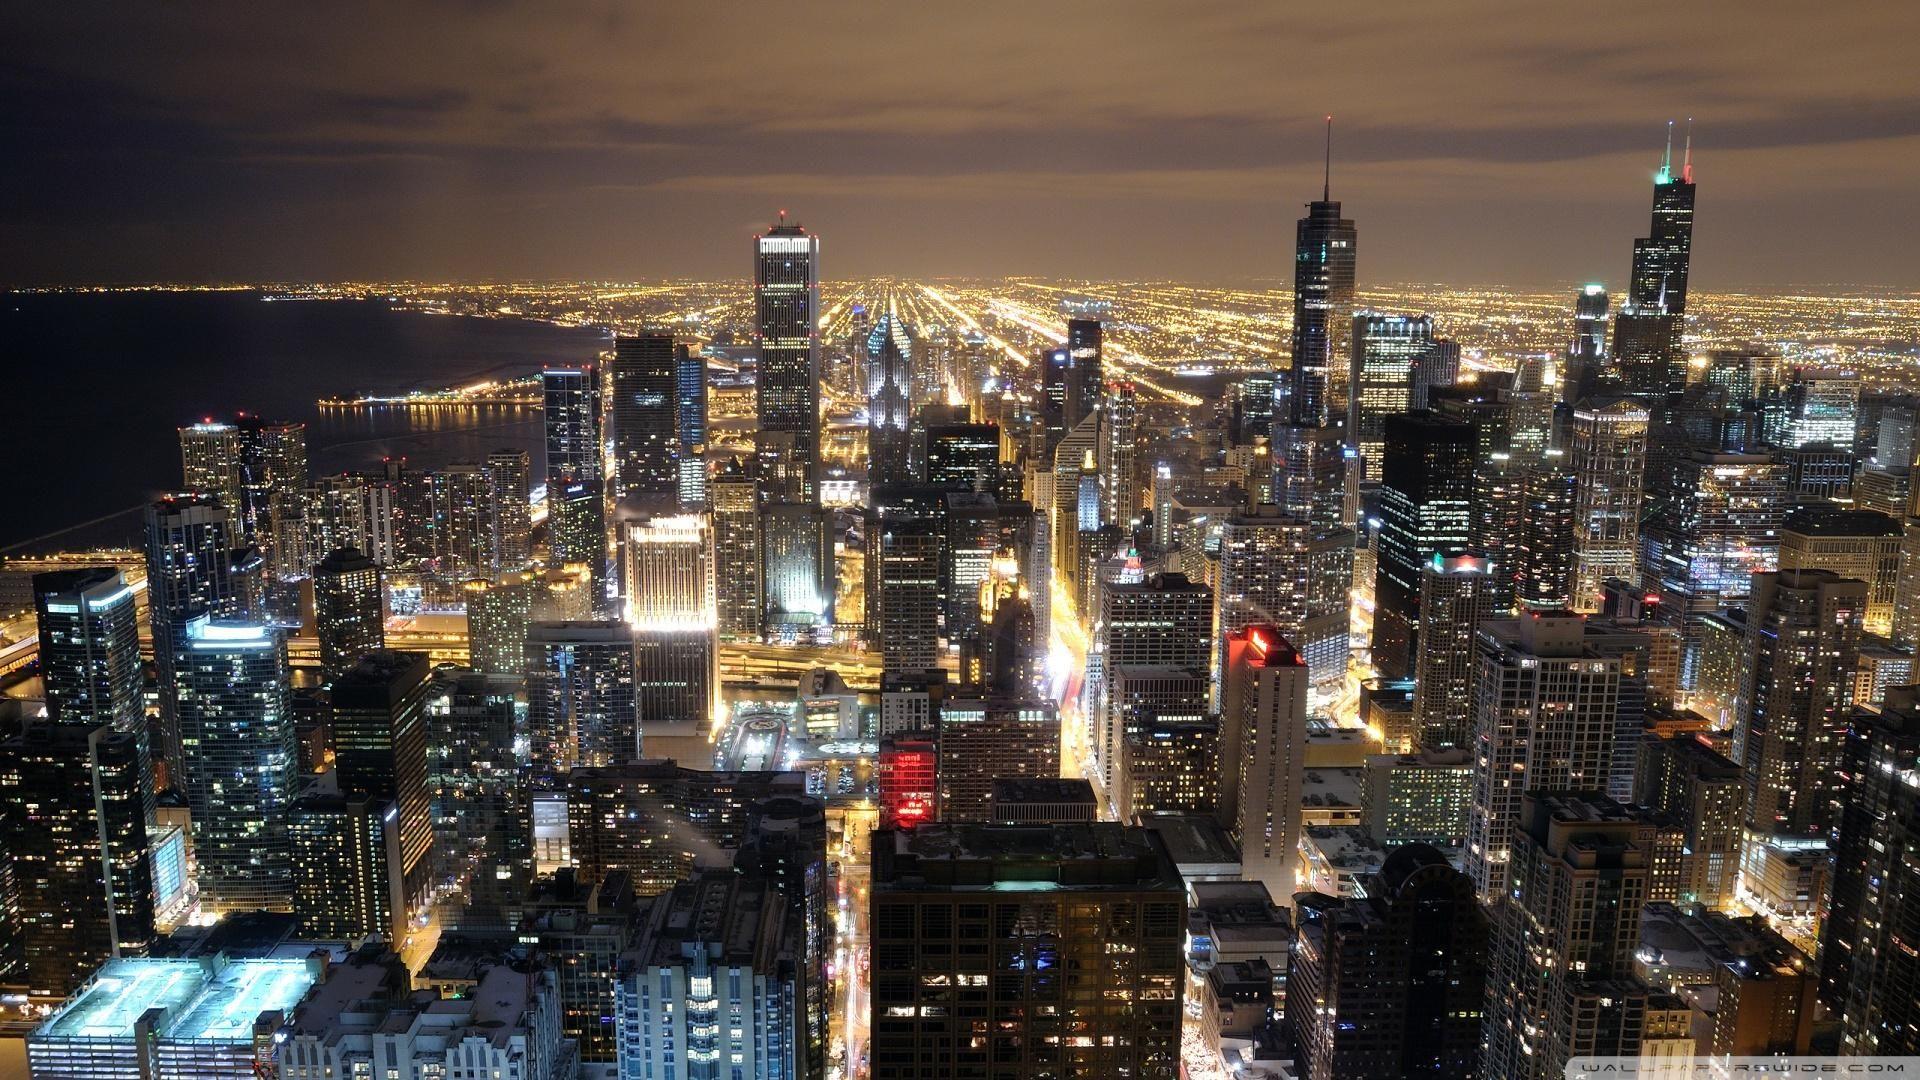 Chicago Skyline at Night HD HD Beautiful Chicago Skyline